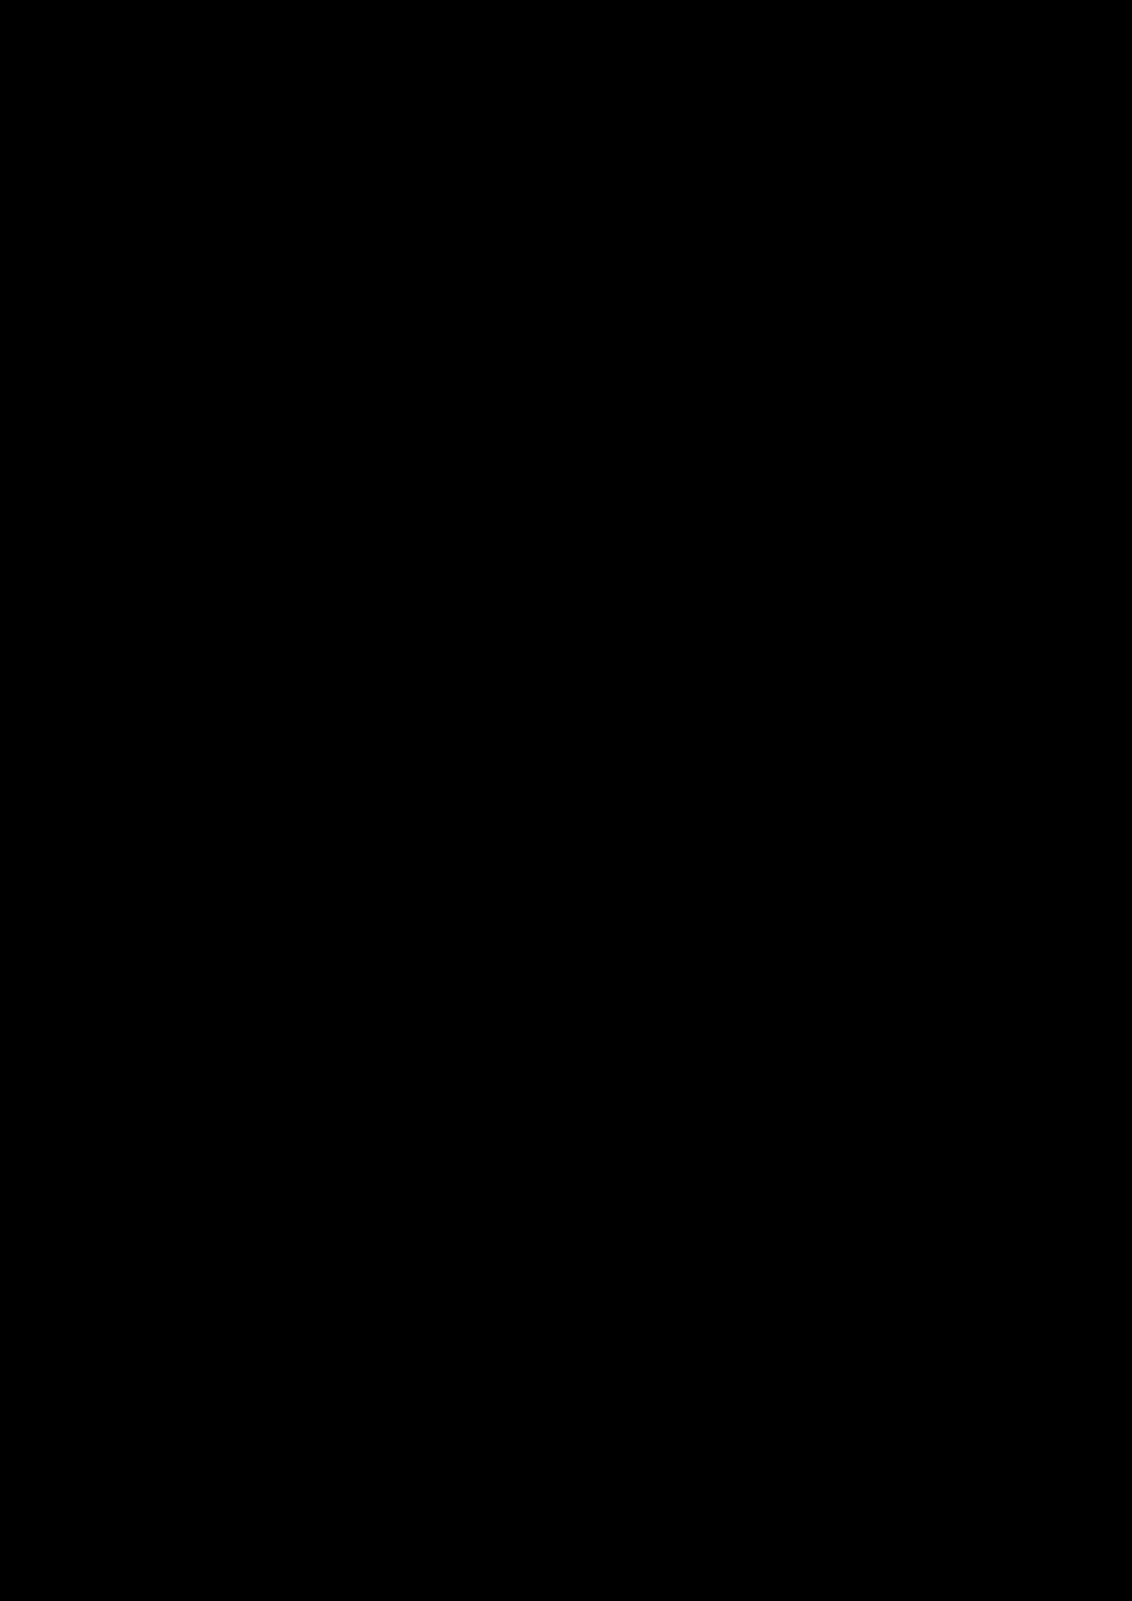 Okean Pustotyi slide, Image 57